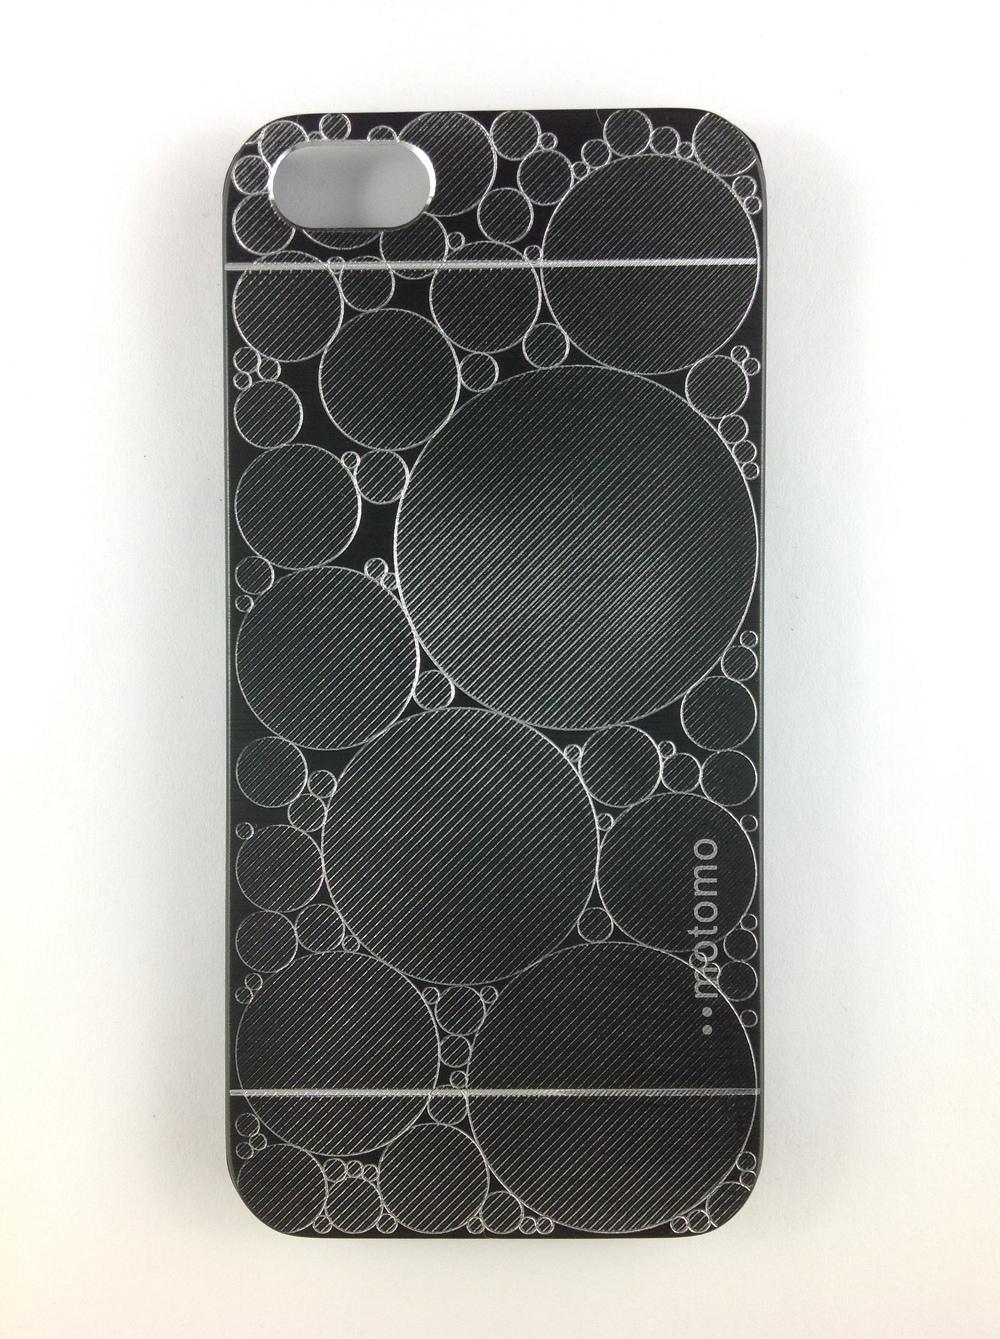 DigitalCarver-iPhone5s-IMG_3697.JPG